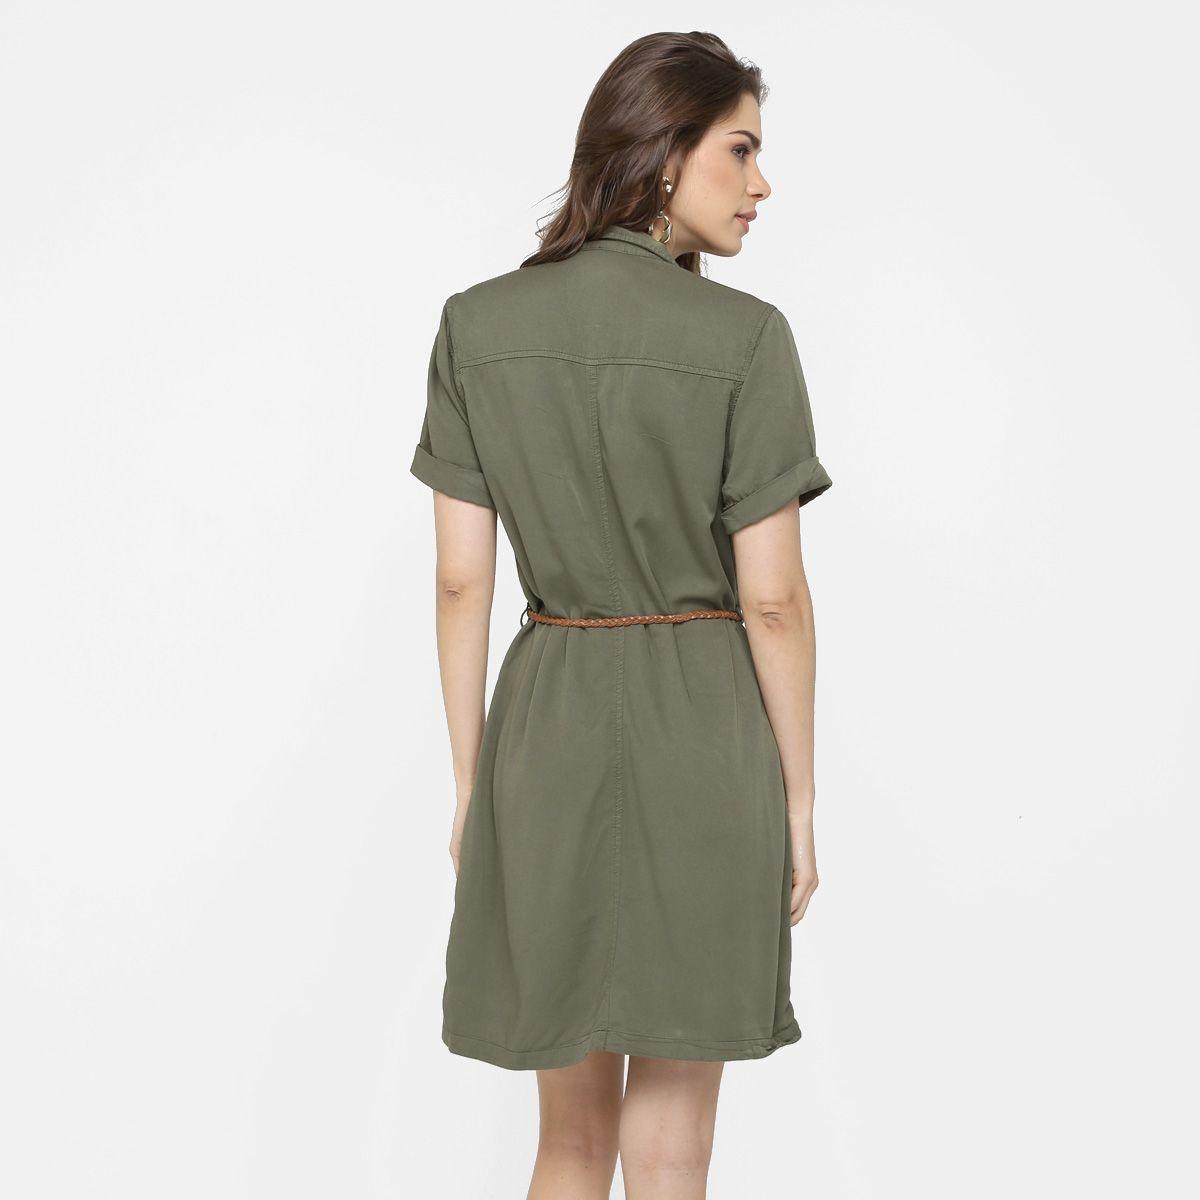 1b83aa997e Vestido Mercatto De Sarja Com Cinto Verde Militar